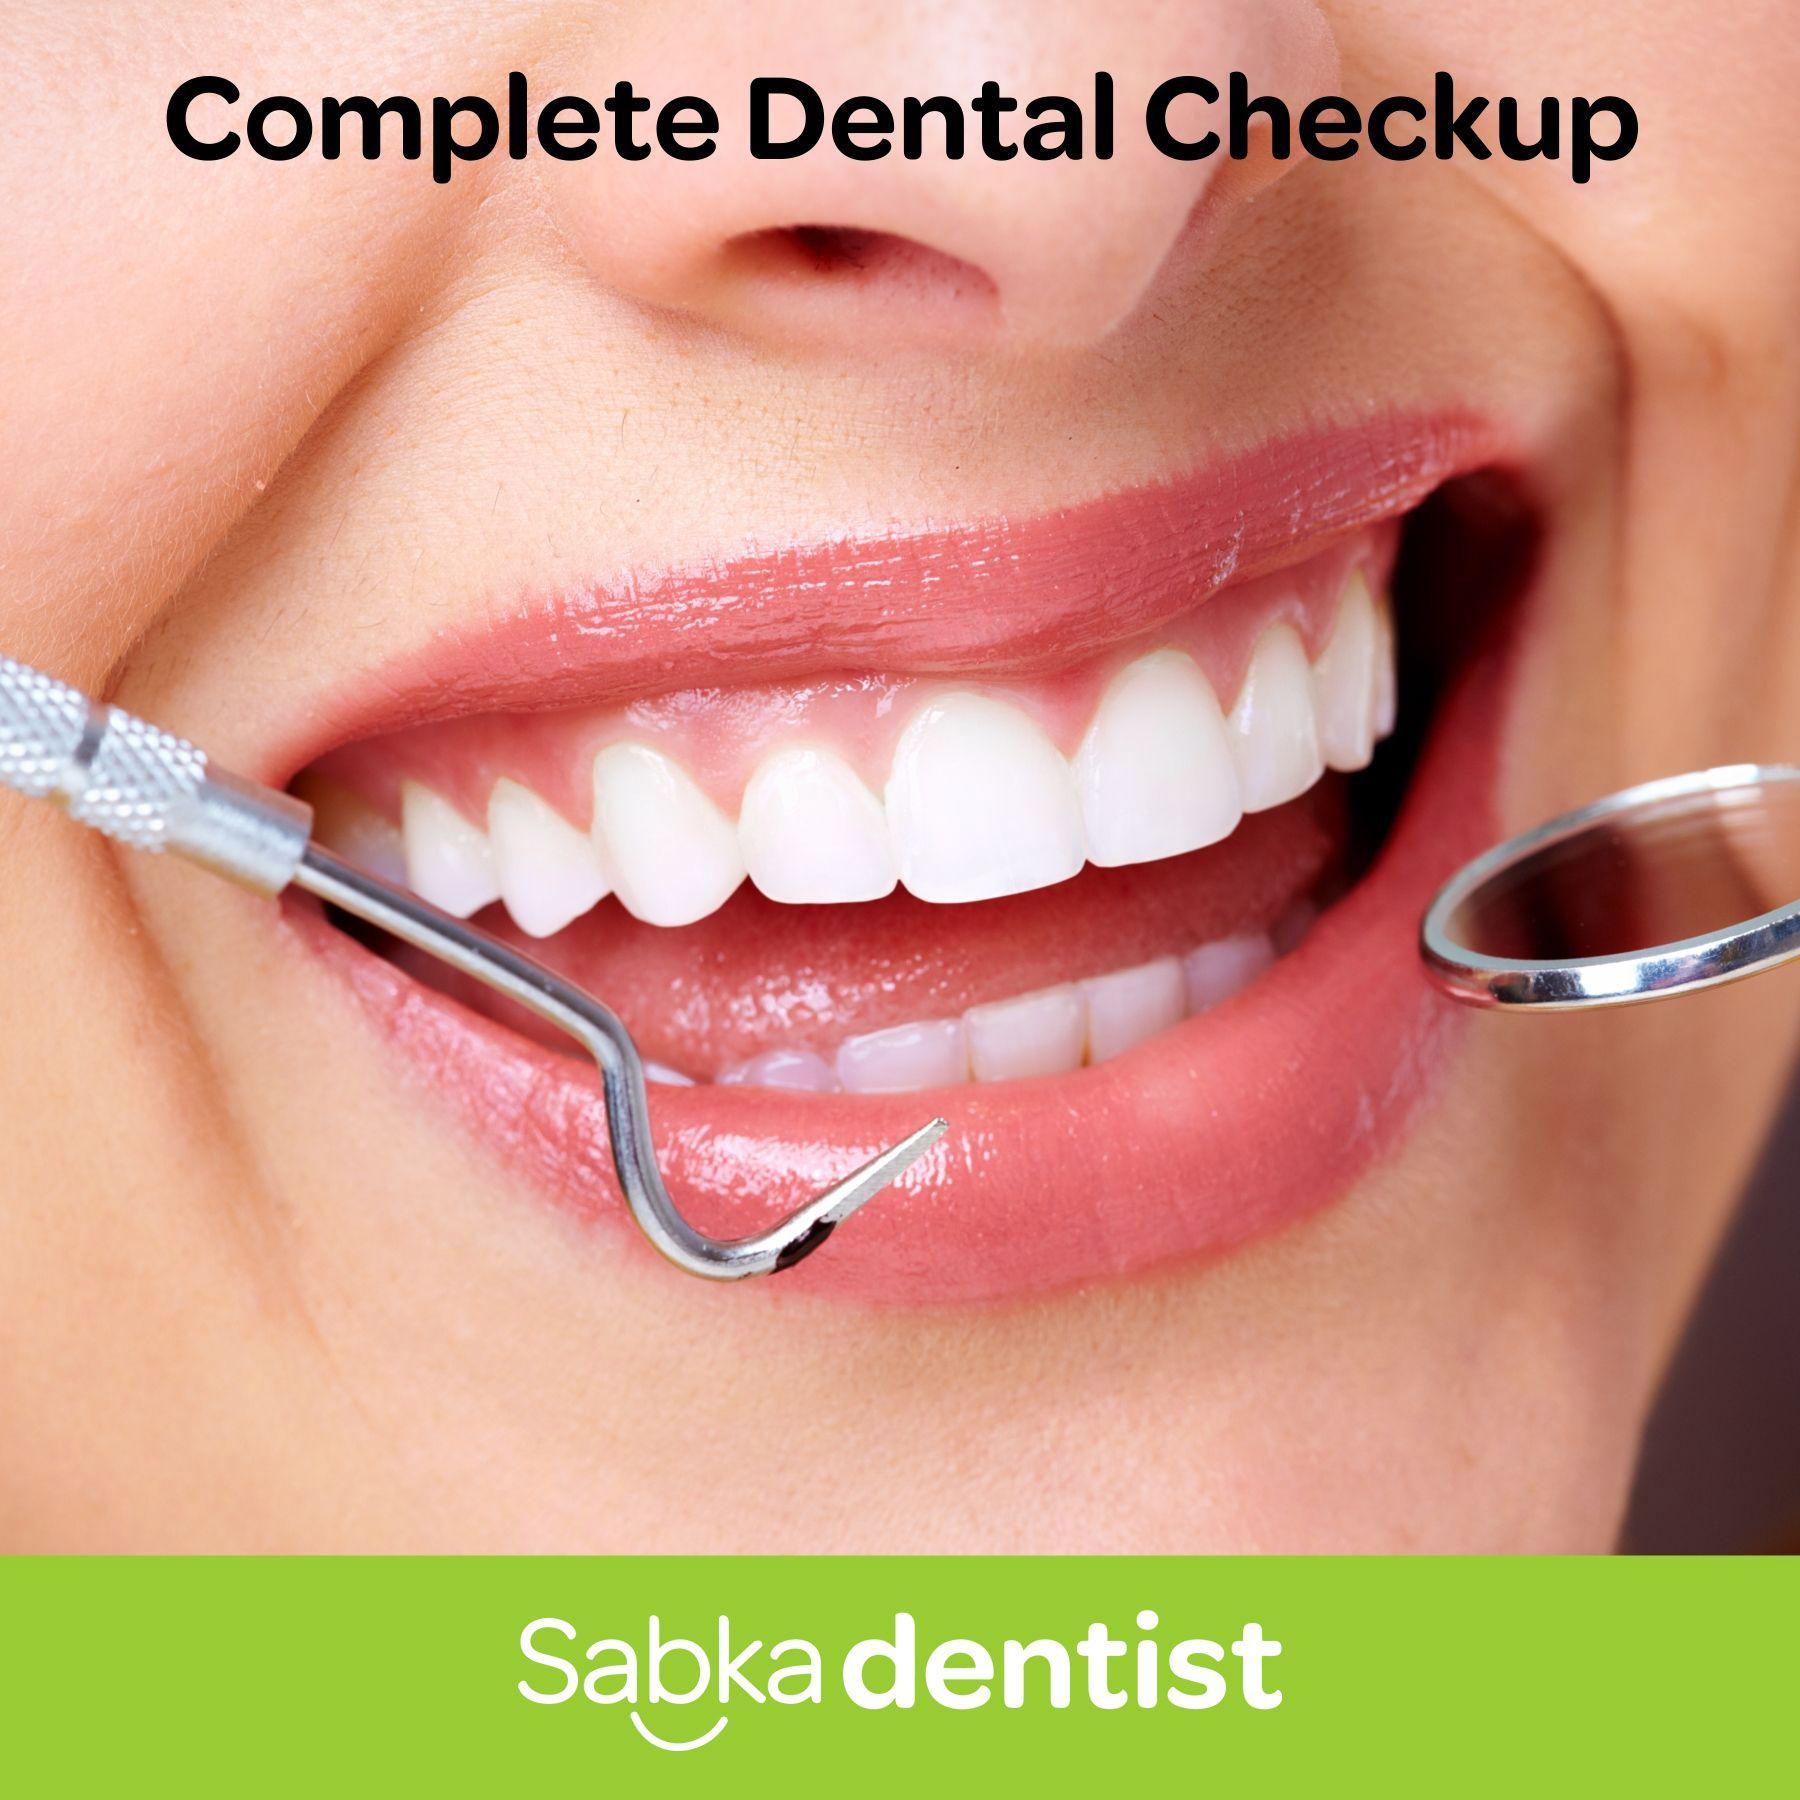 Regular dental checkups will help you maintain a healthier